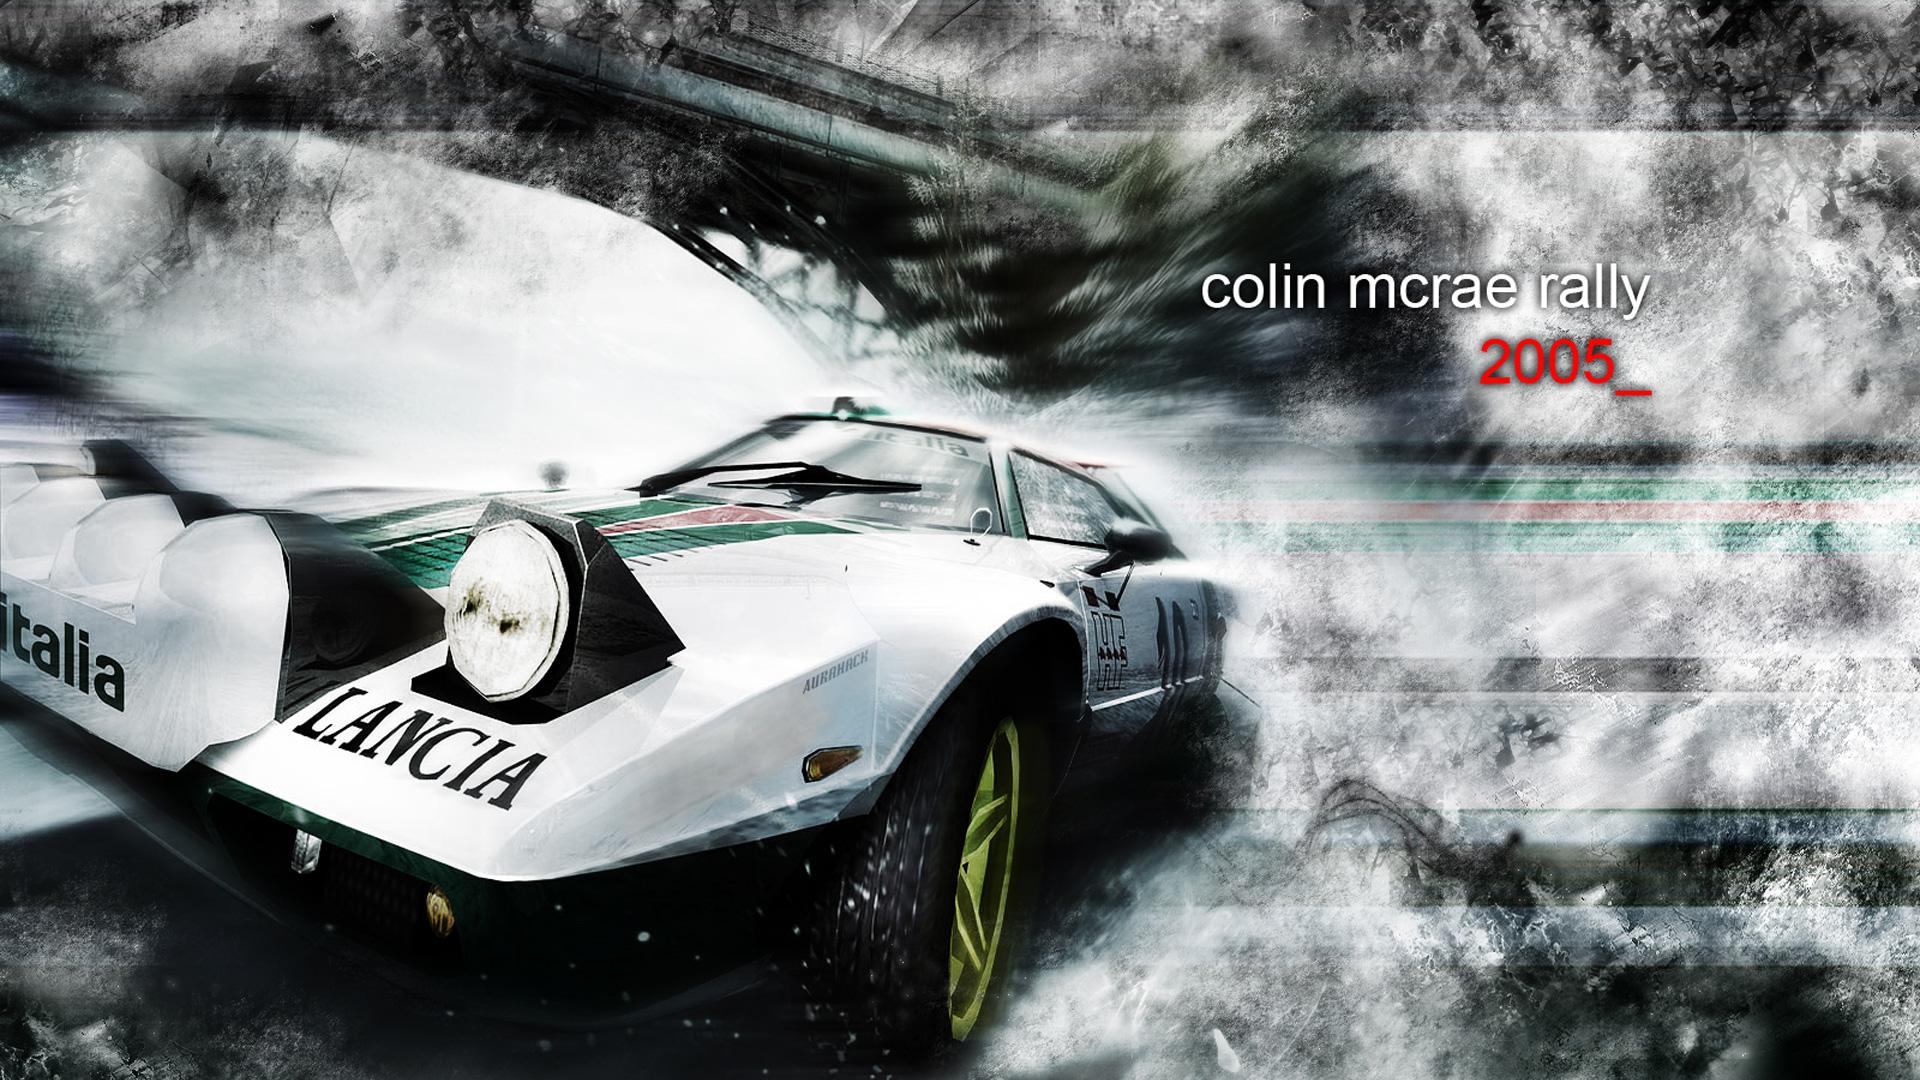 Free Colin McRae Rally 2005 Wallpaper in 1920x1080